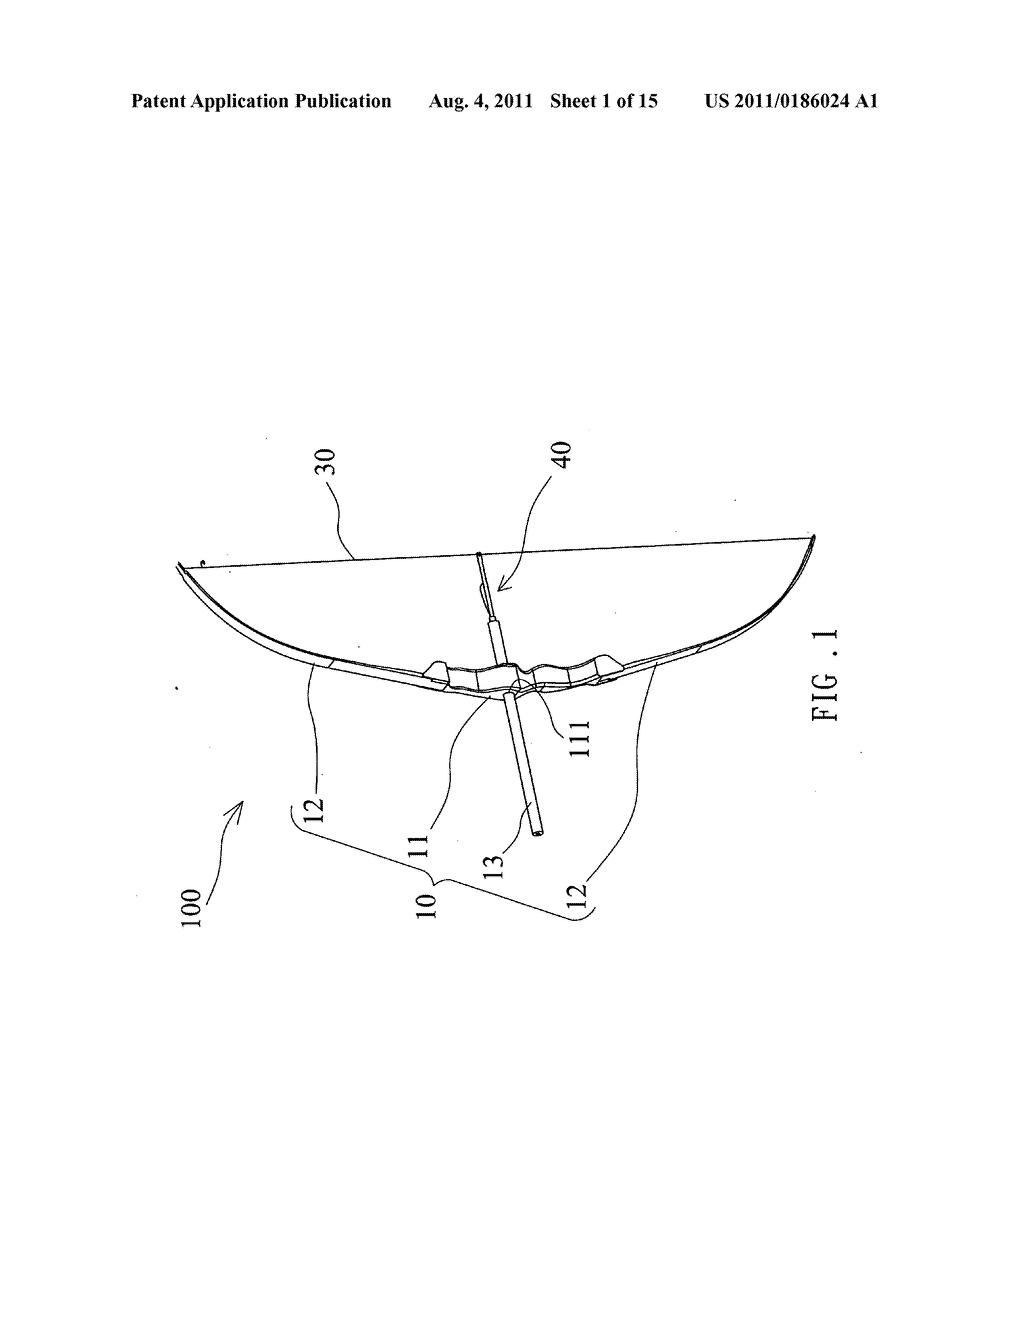 bow and arrow diagram schematic and image 02 rh patentsencyclopedia com circuit diagram arrow pointing resistor circuit diagram symbols arrow